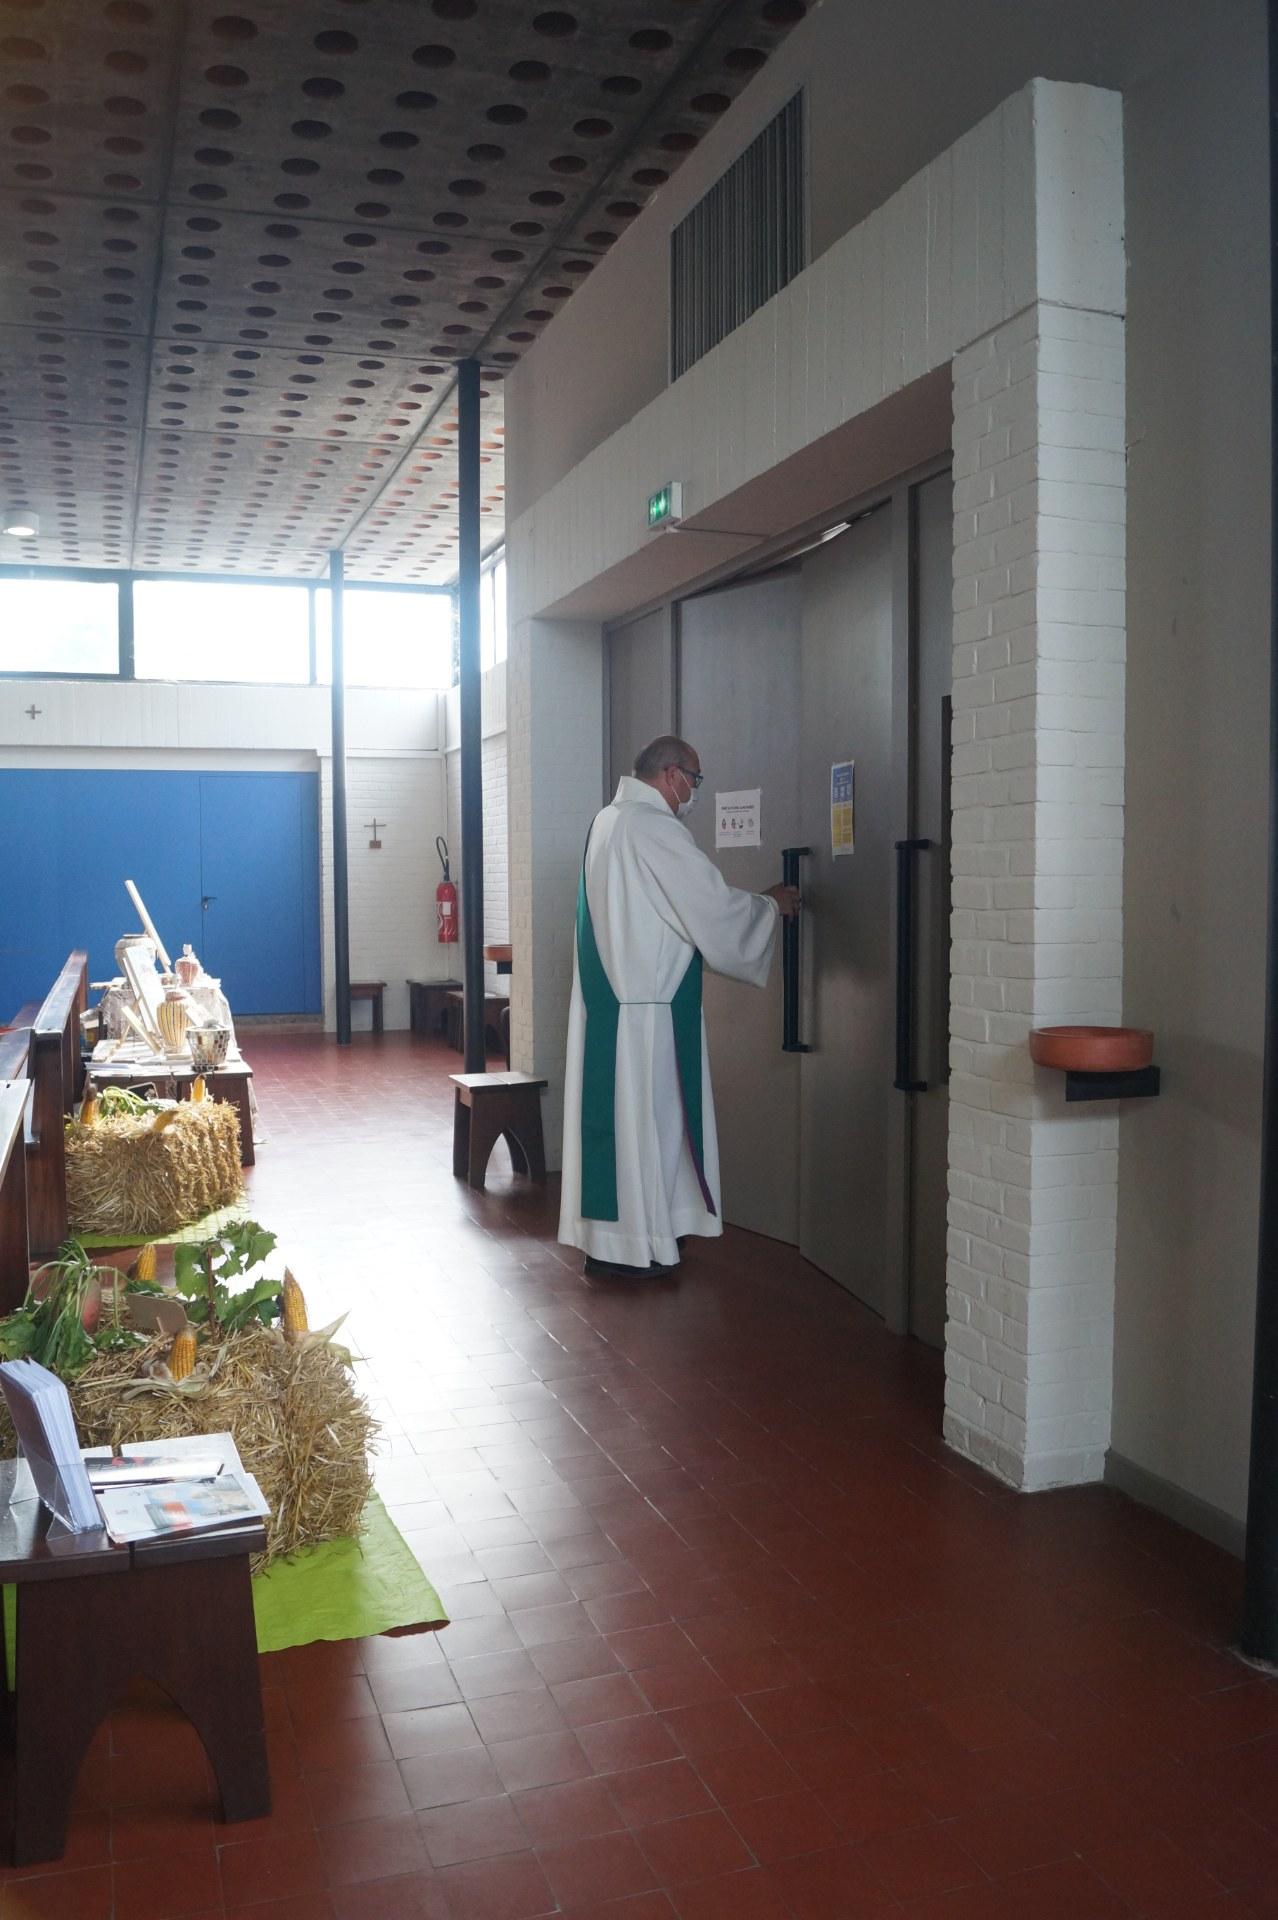 entree en catechumenat 6 sept 2020 (7)